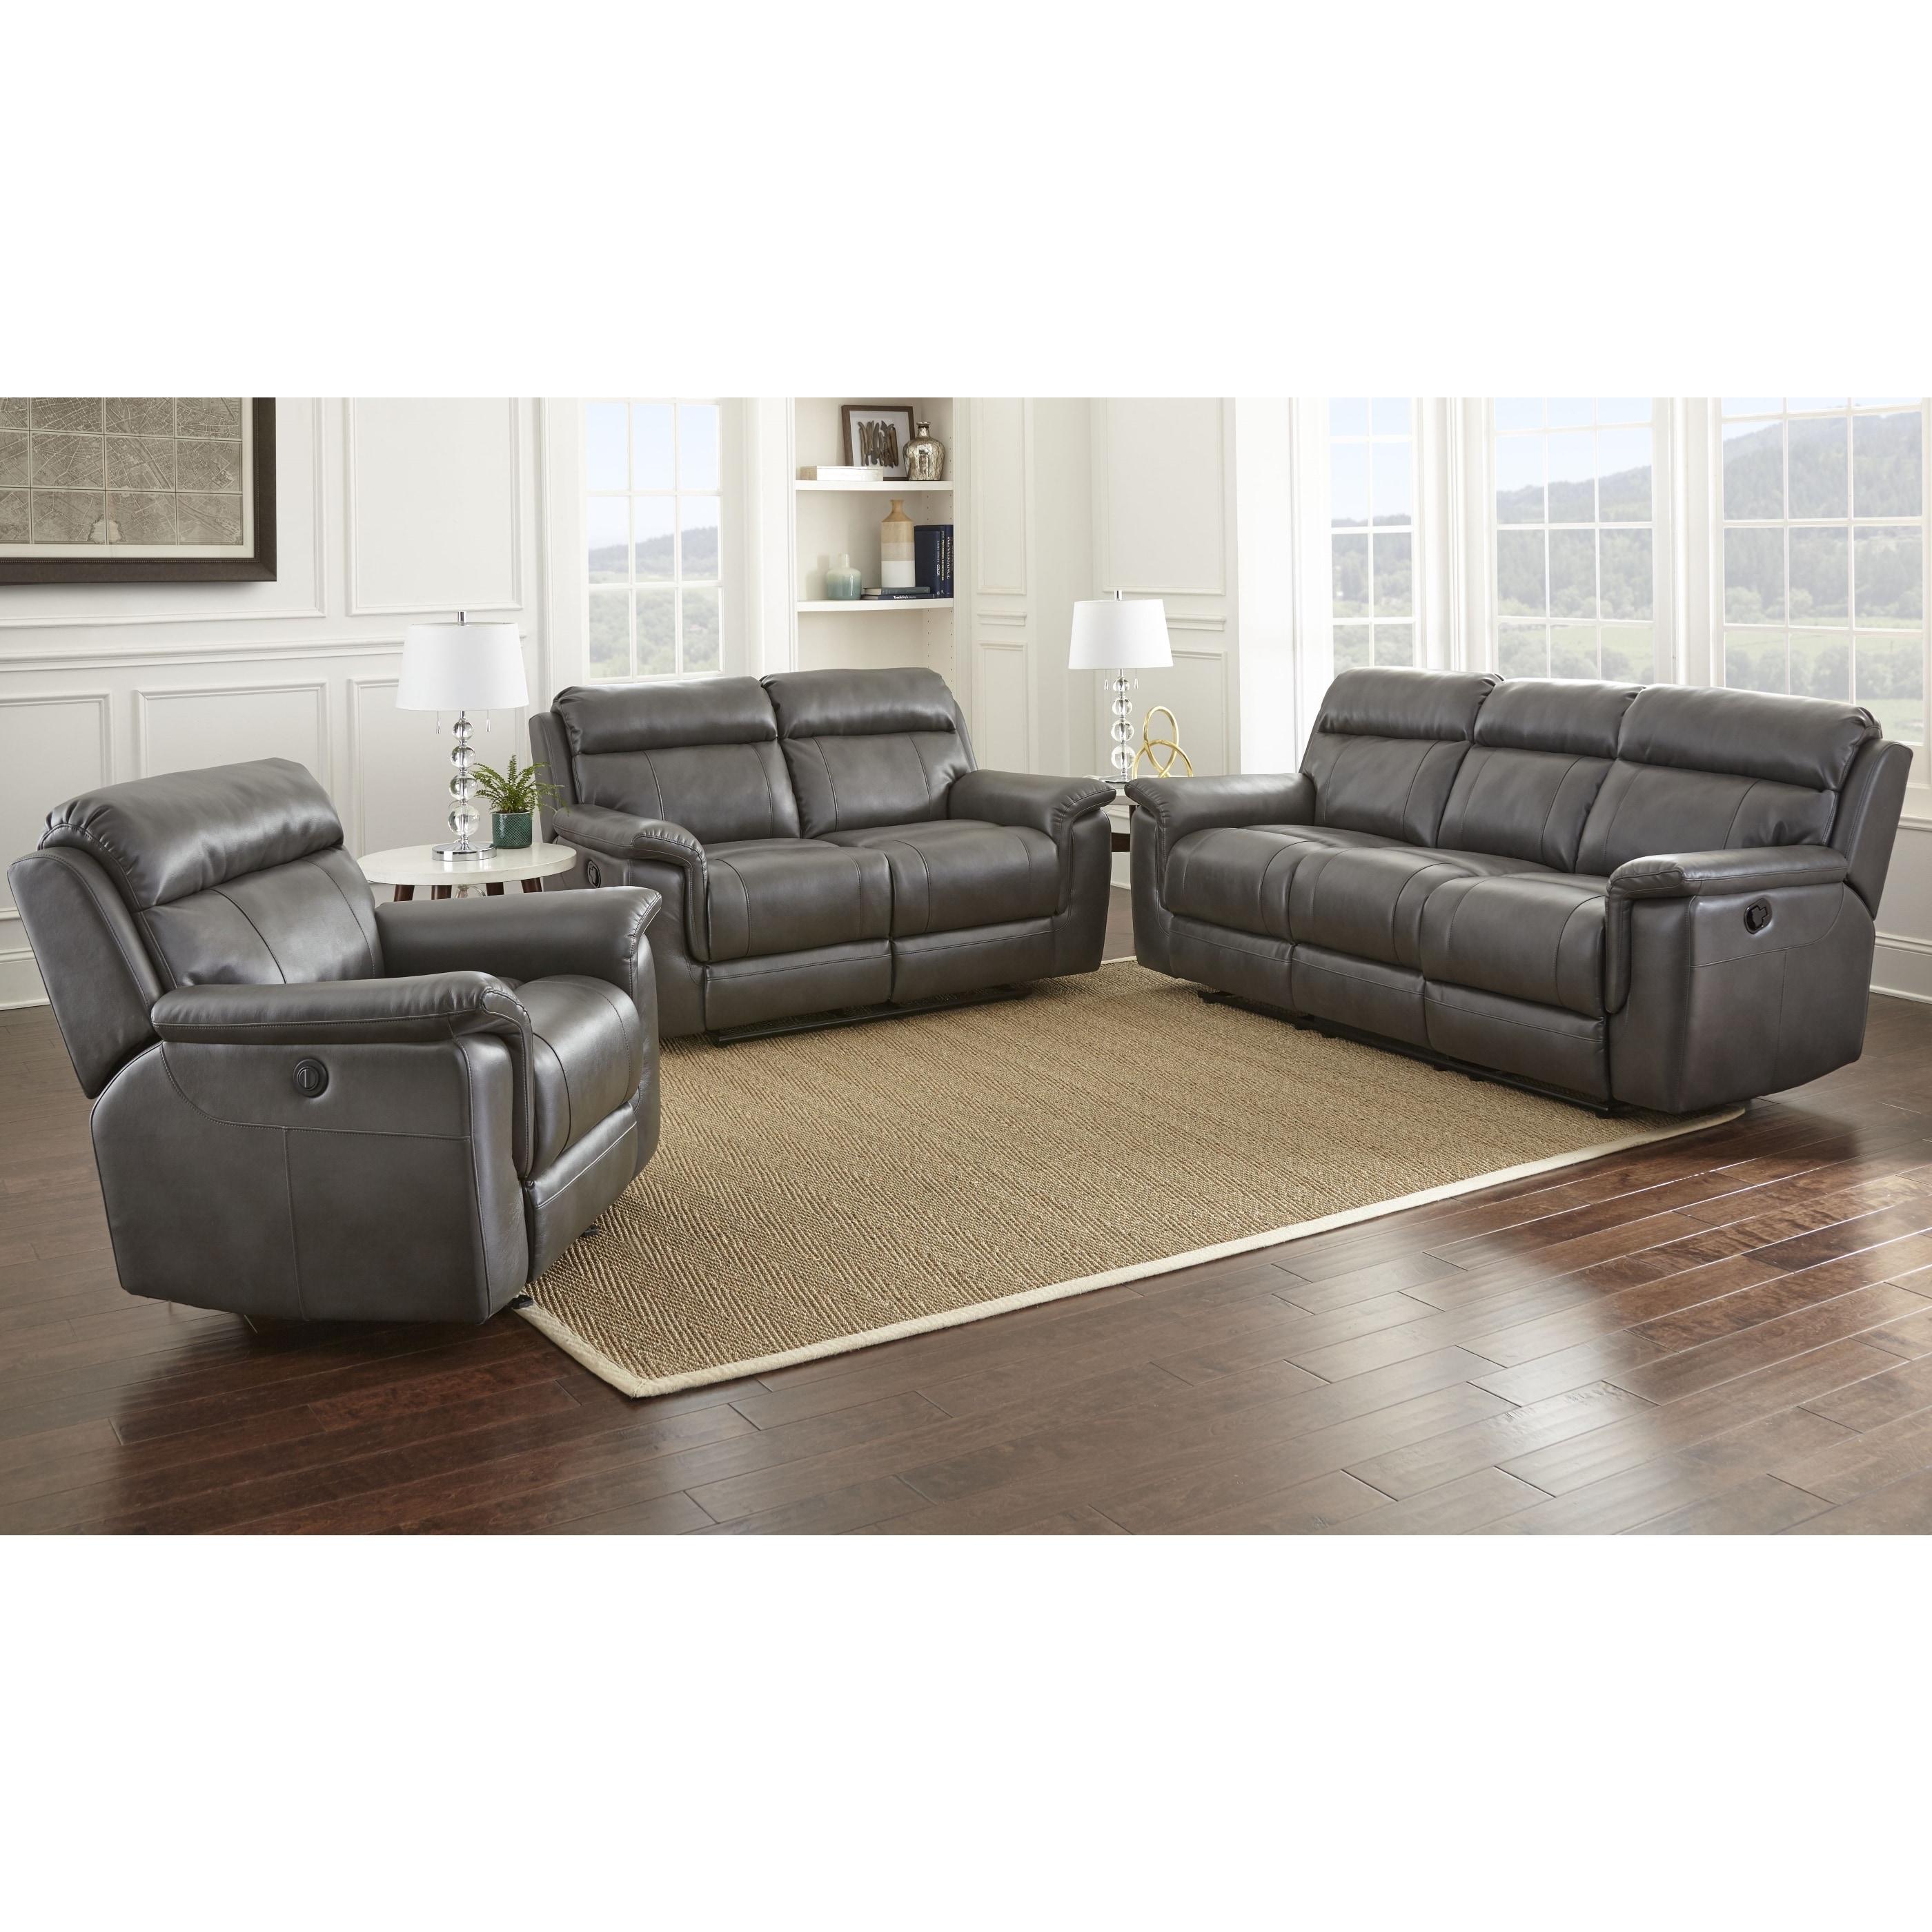 Denver Reclining Sofa By Greyson Living